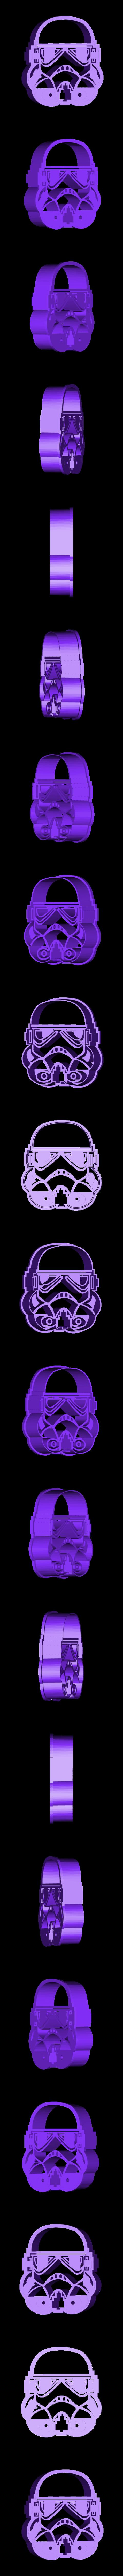 Strom.STL Download free STL file Stormtrooper Cookie Cutter • Design to 3D print, Platridi